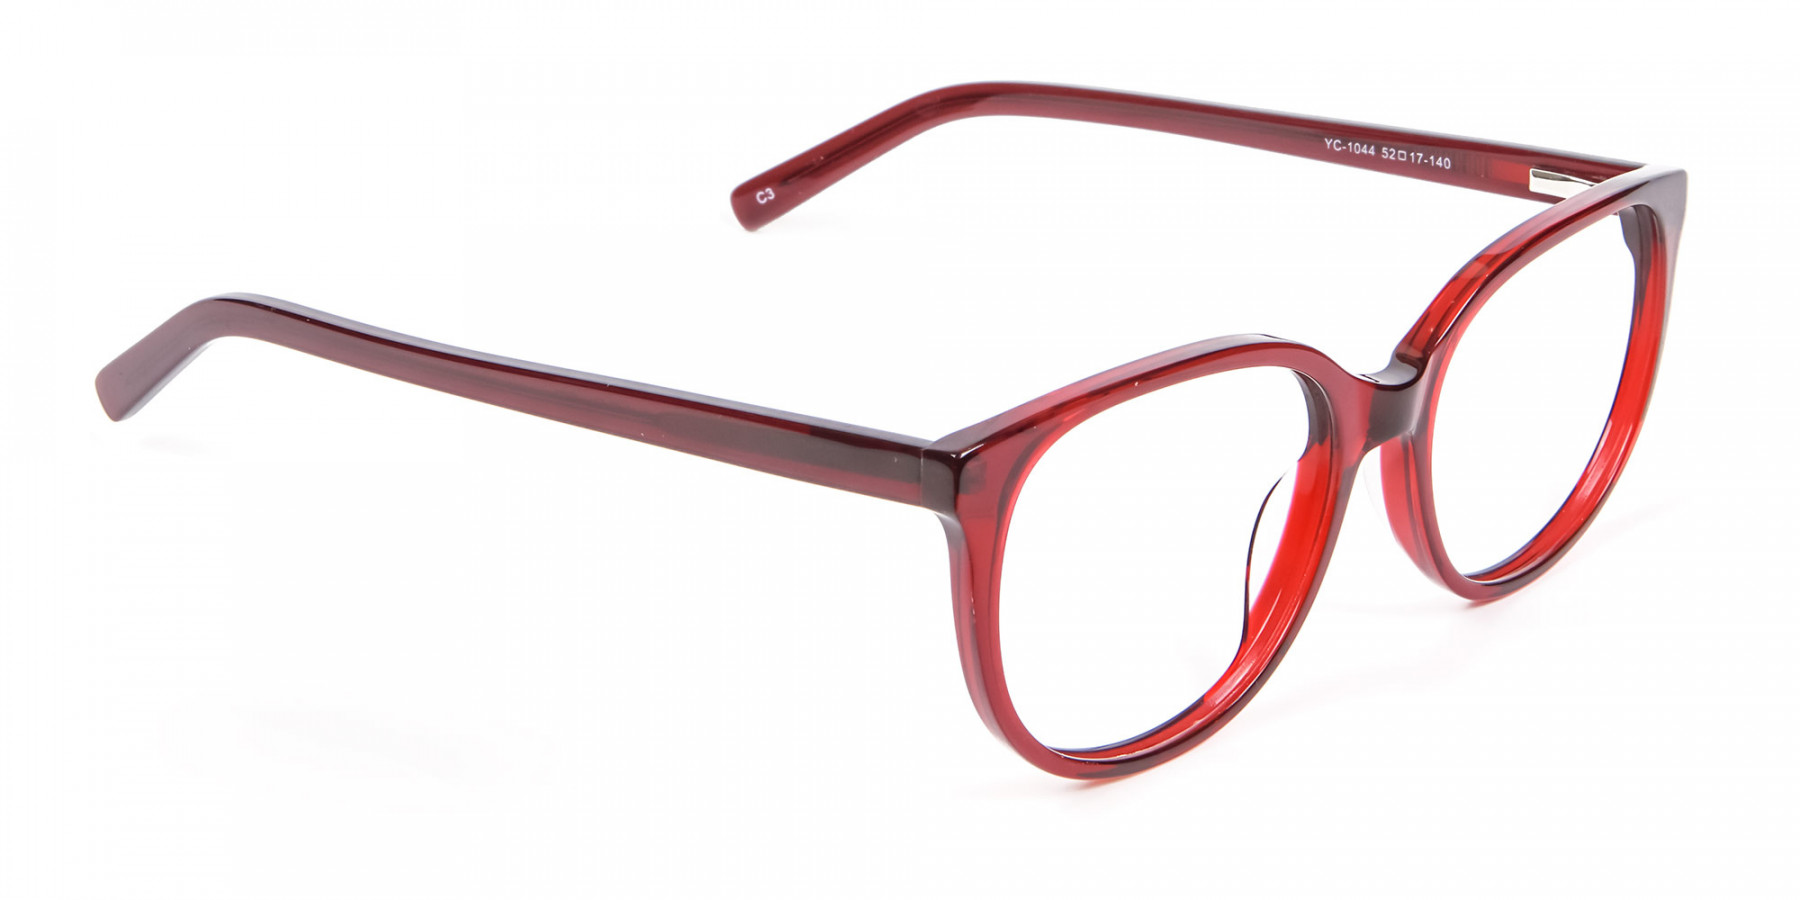 Indulging Designer Frame in Cherry Red, Online